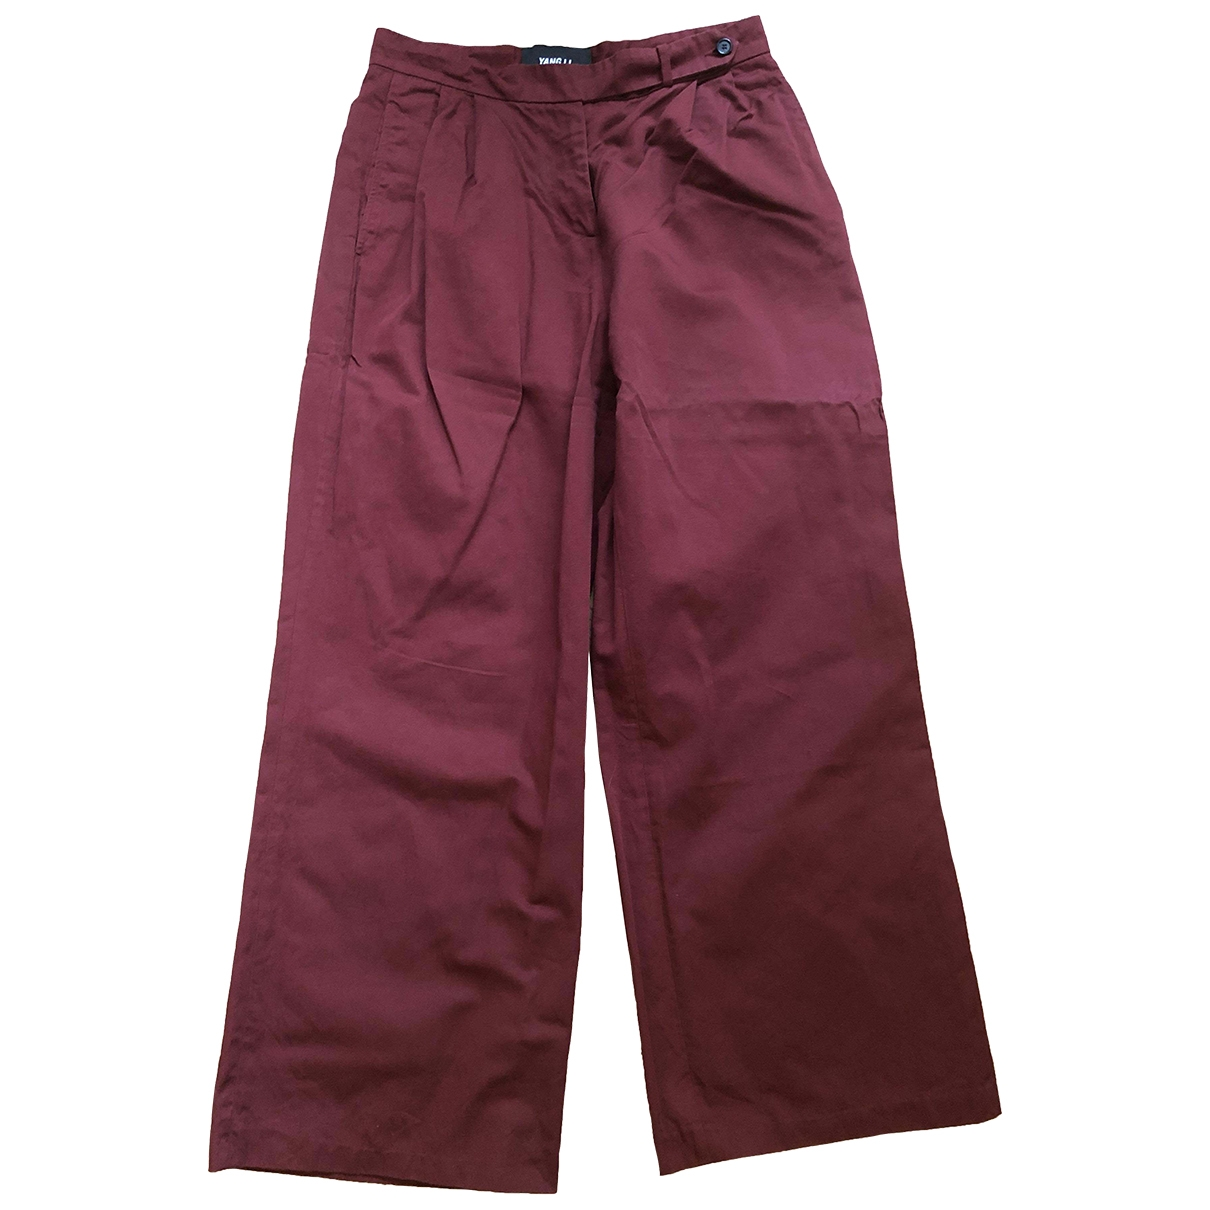 Pantalon recto Yang Li